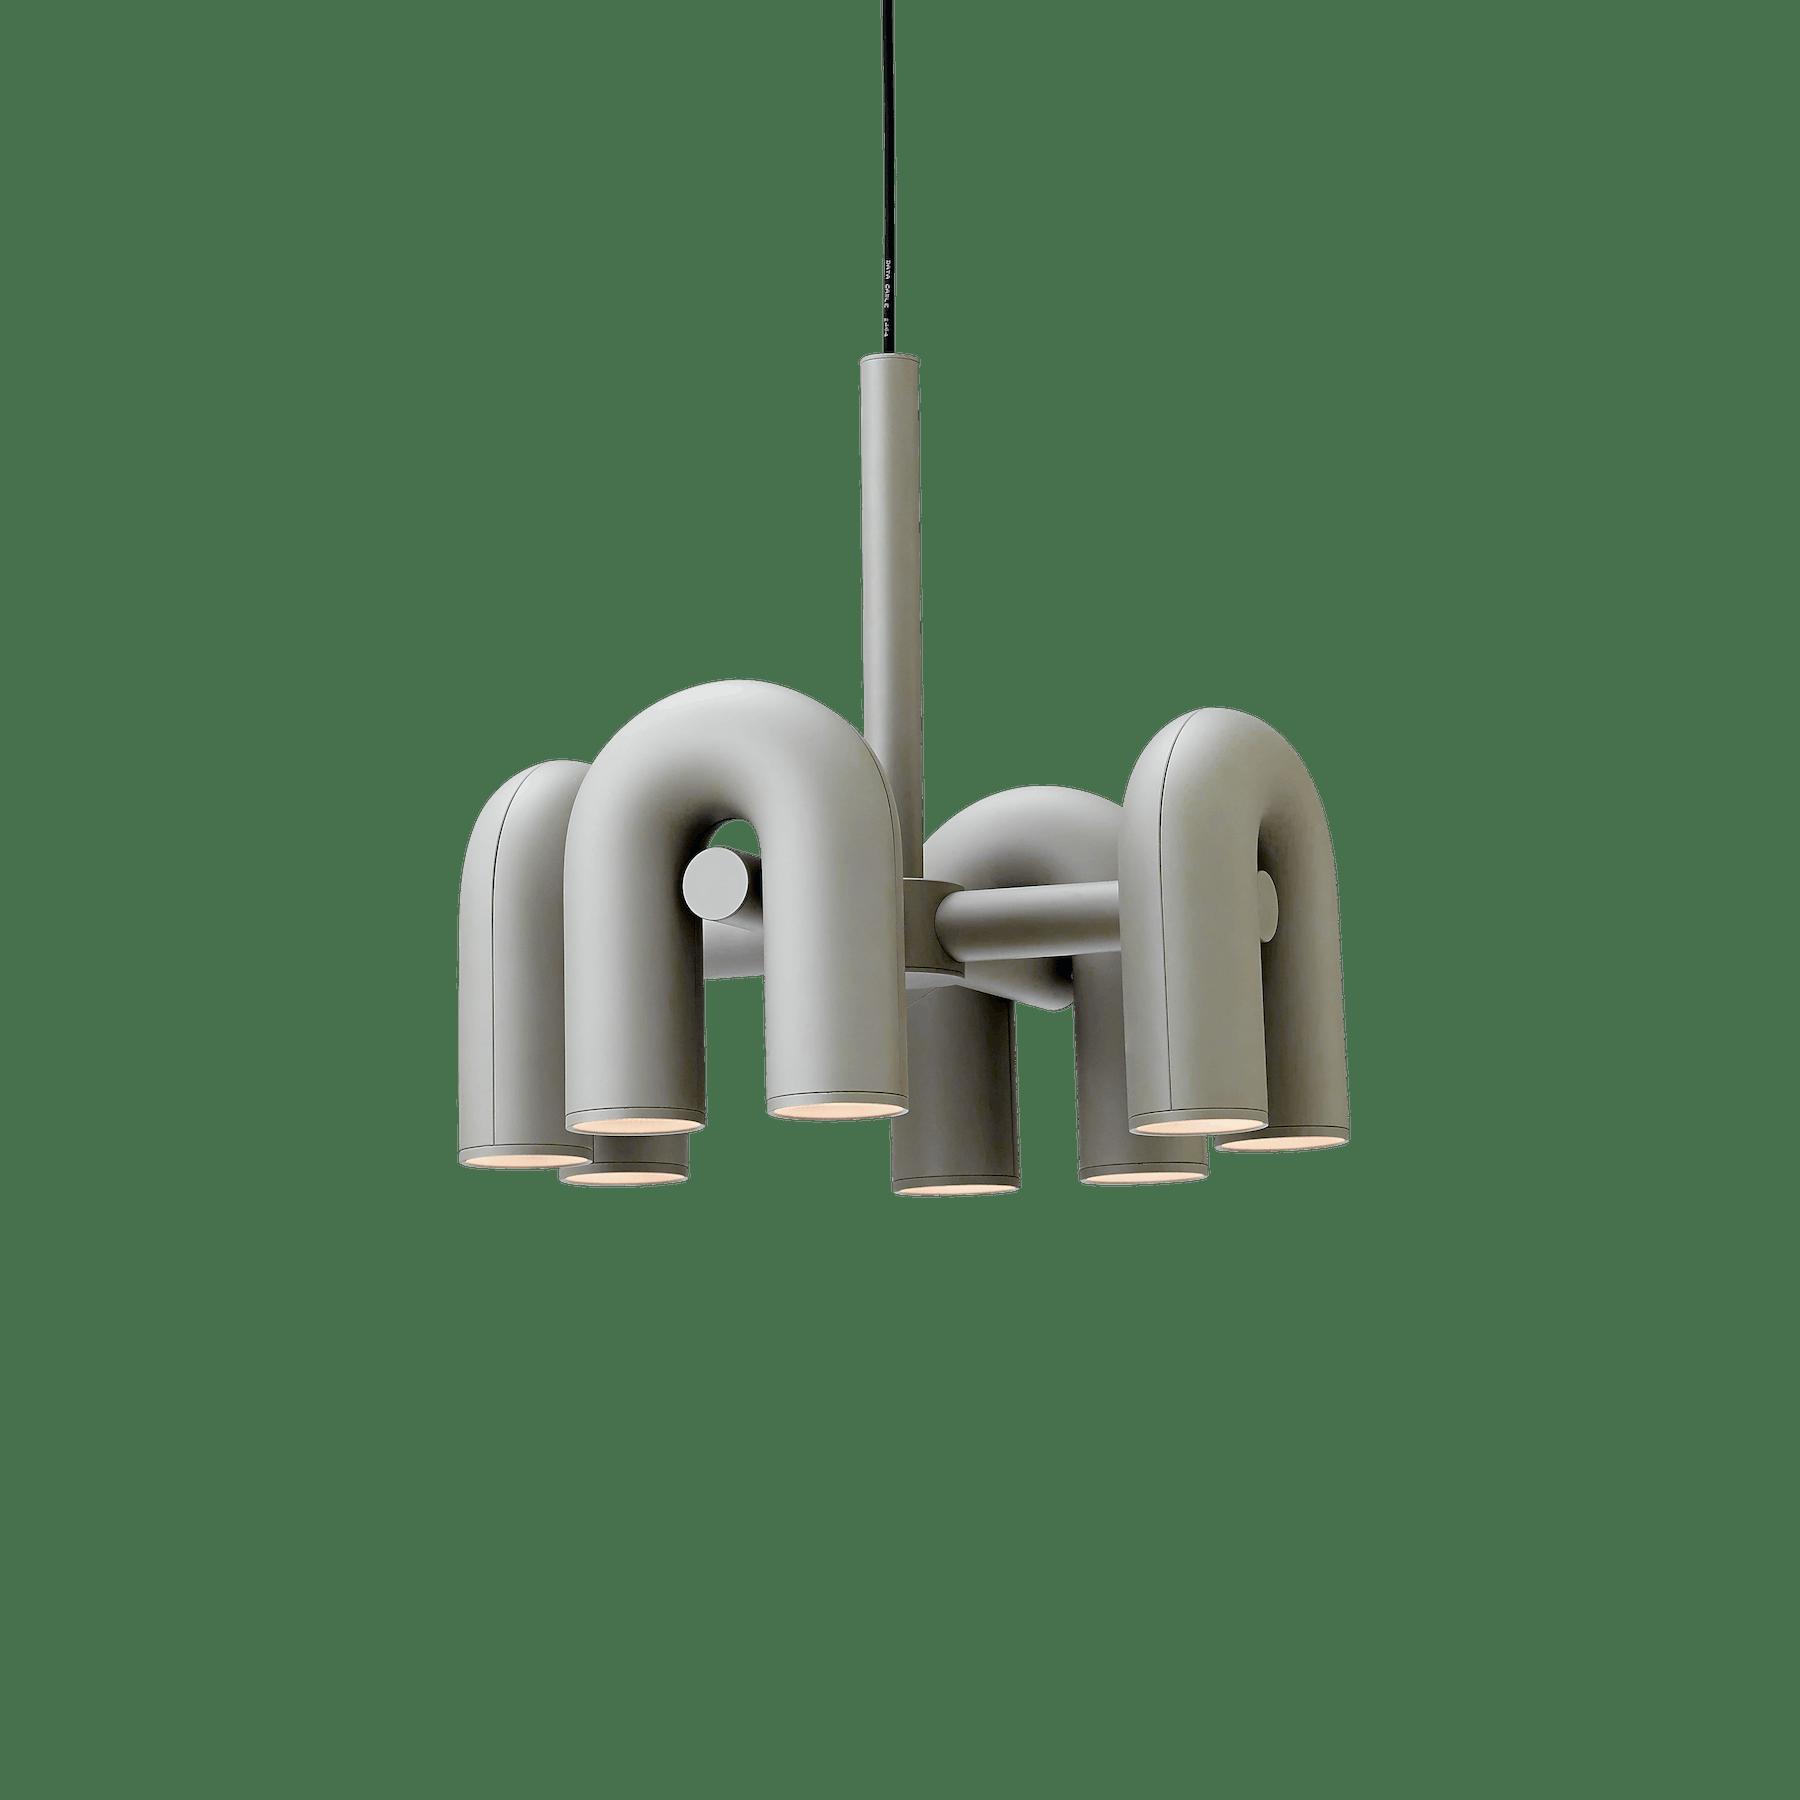 Ago lighting small circkus chandelier grey haute living